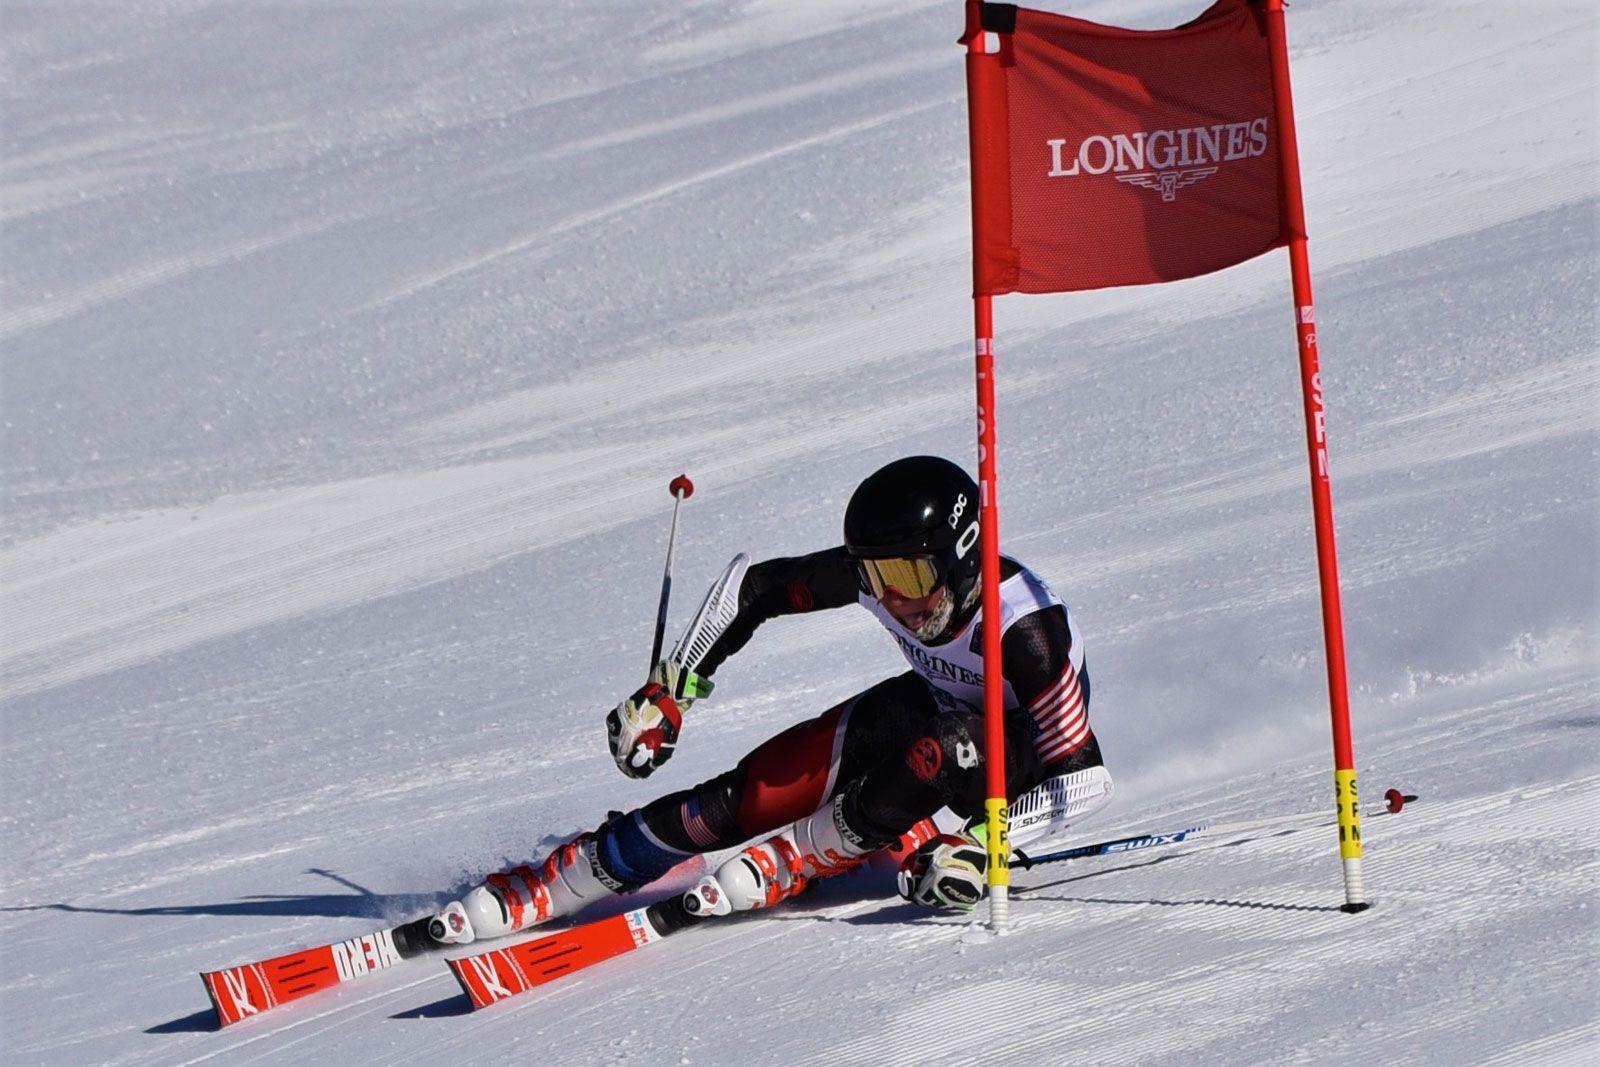 America's Best 15YearOld Ski Racer Is From Colorado